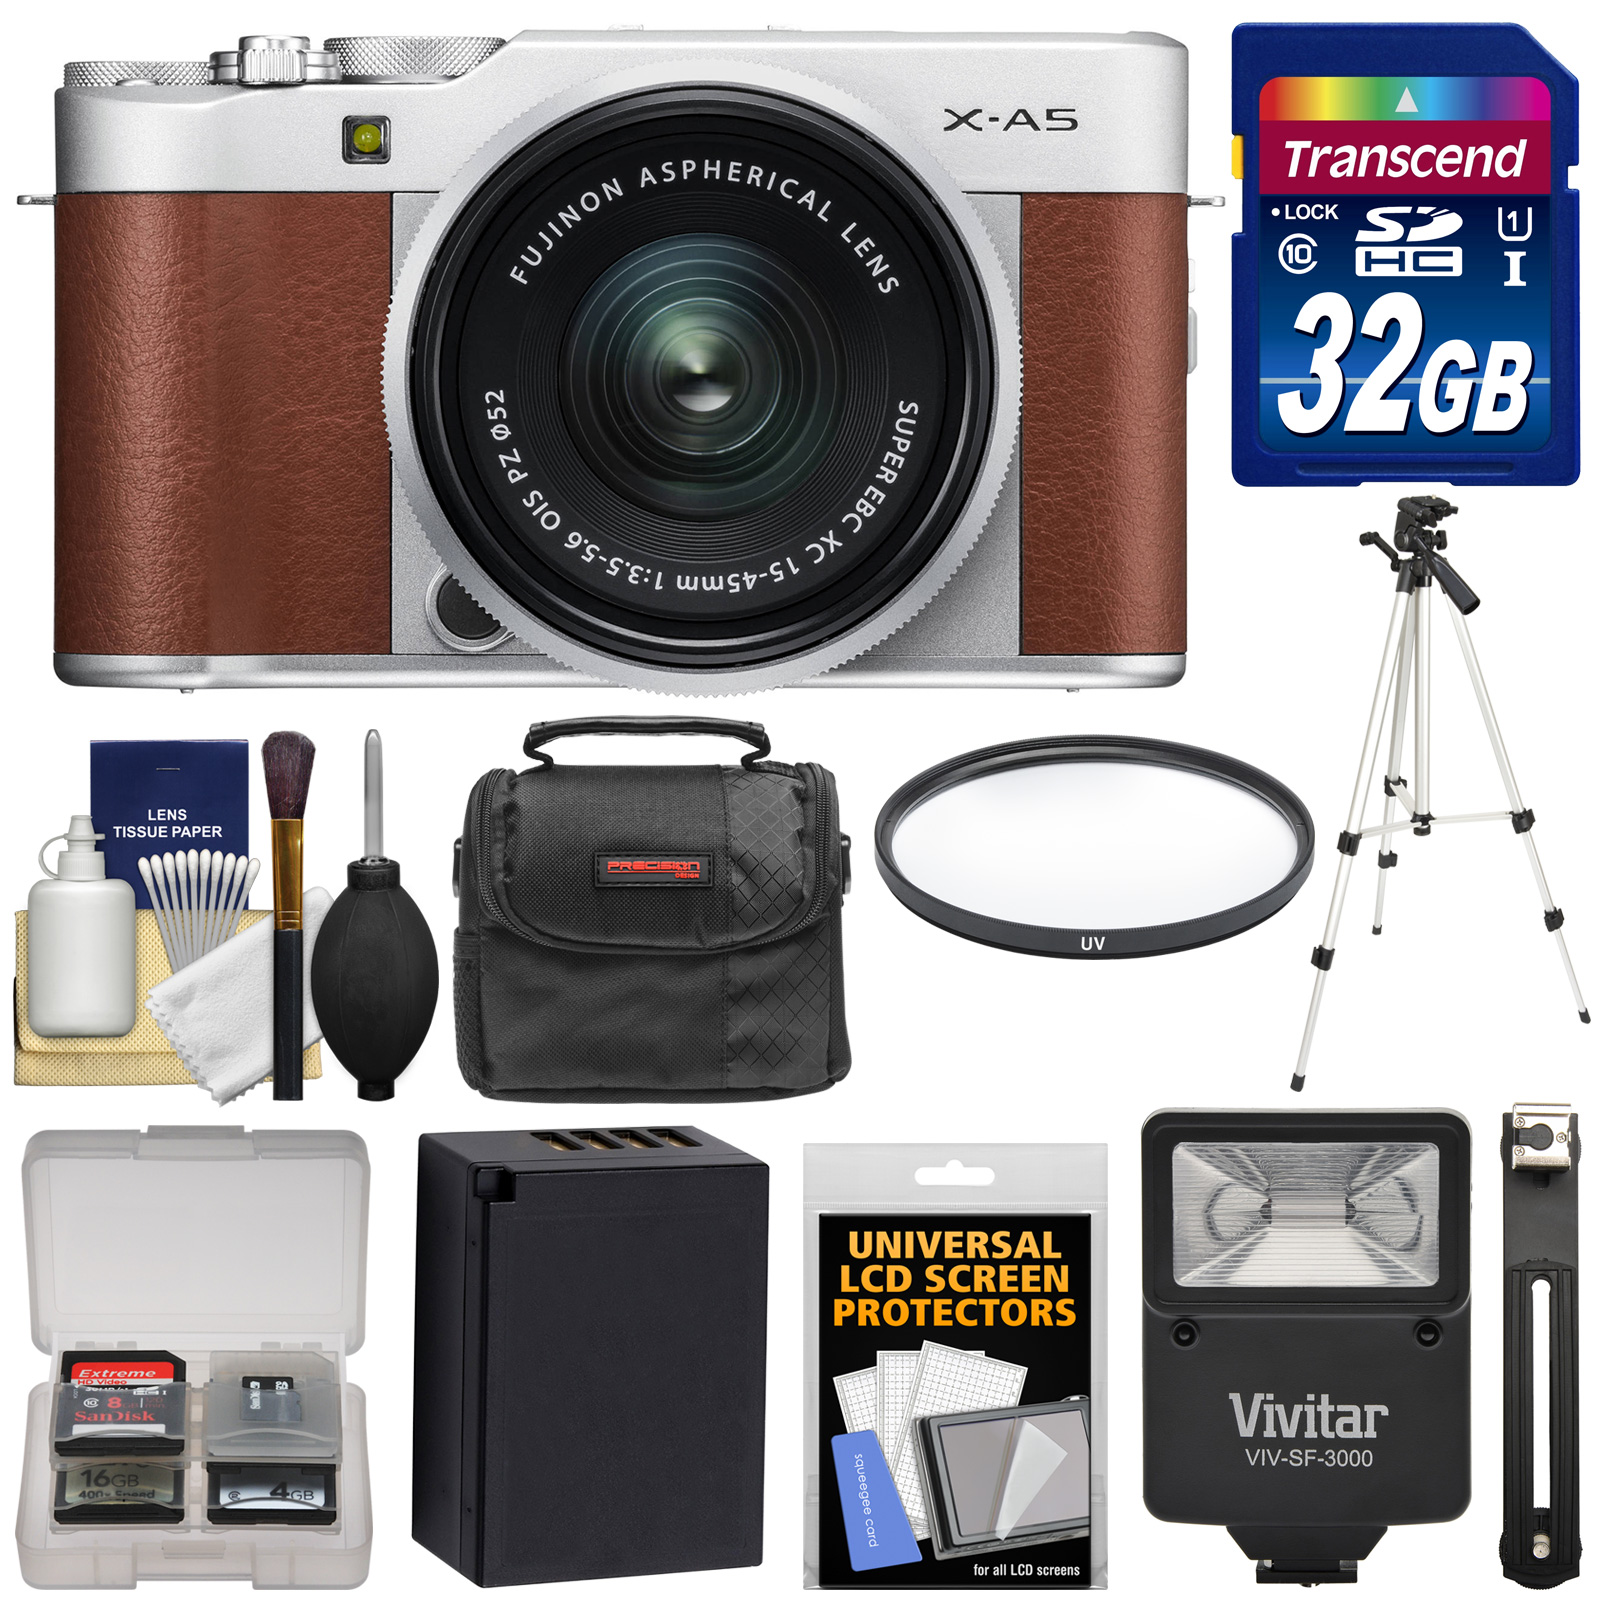 Fujifilm X-A5 Wi-Fi Digital Camera & 15-45mm XC Lens (Brown) with 32GB Card + Battery + Case + Tripod + Flash + Filter + Kit